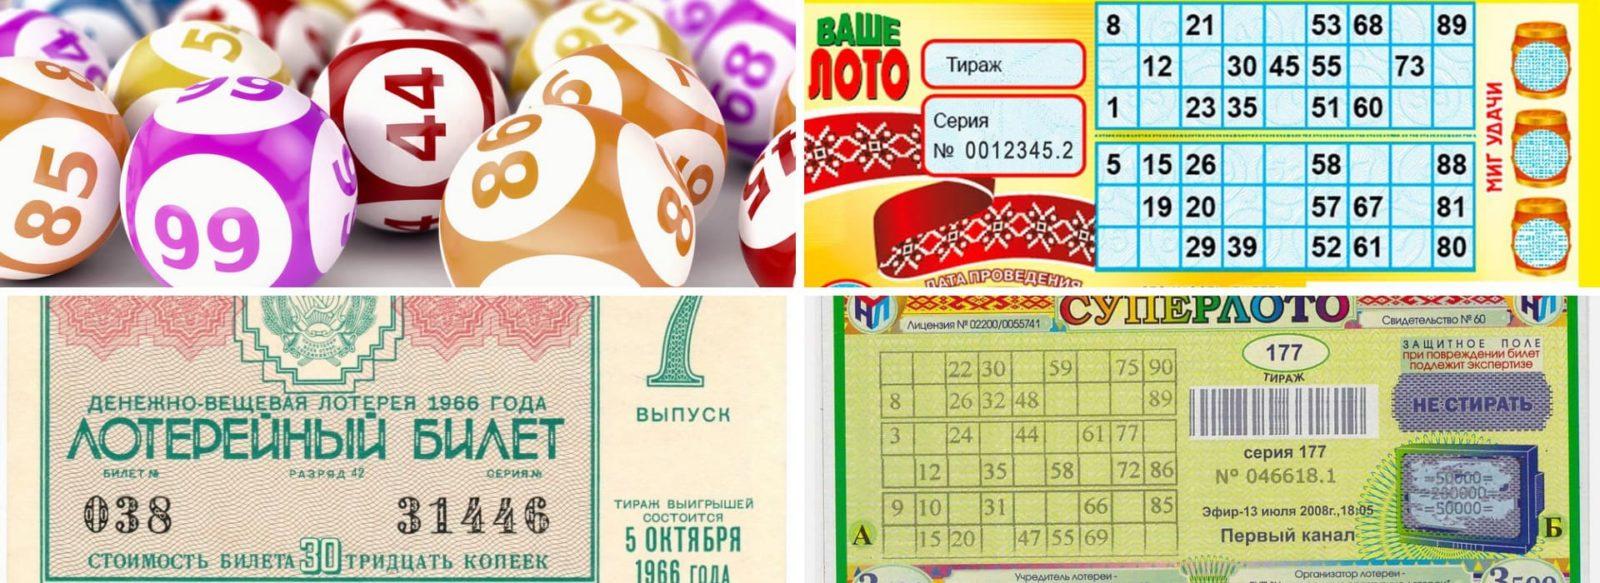 старые лотерейные билеты